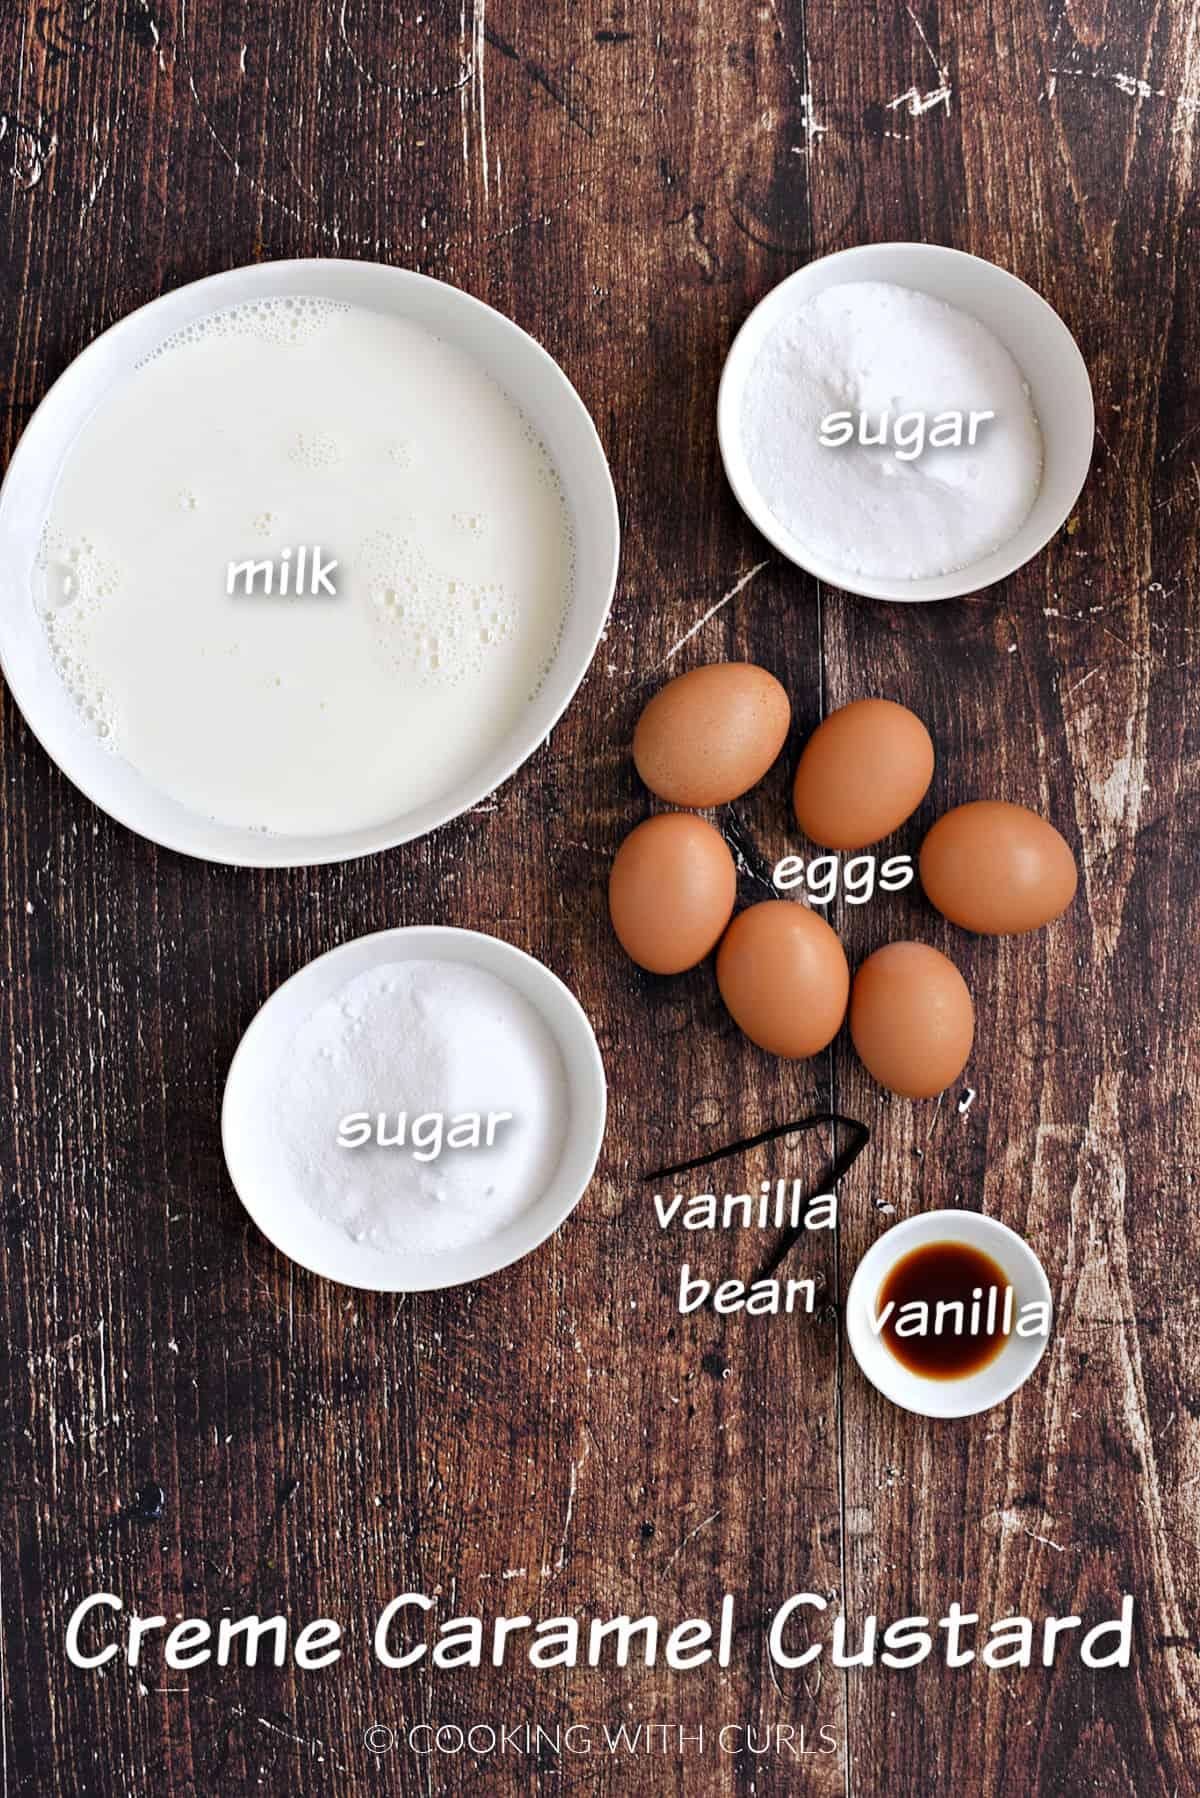 Milk, eggs, sugar, vanilla extract and vanilla bean to make caramel custard.